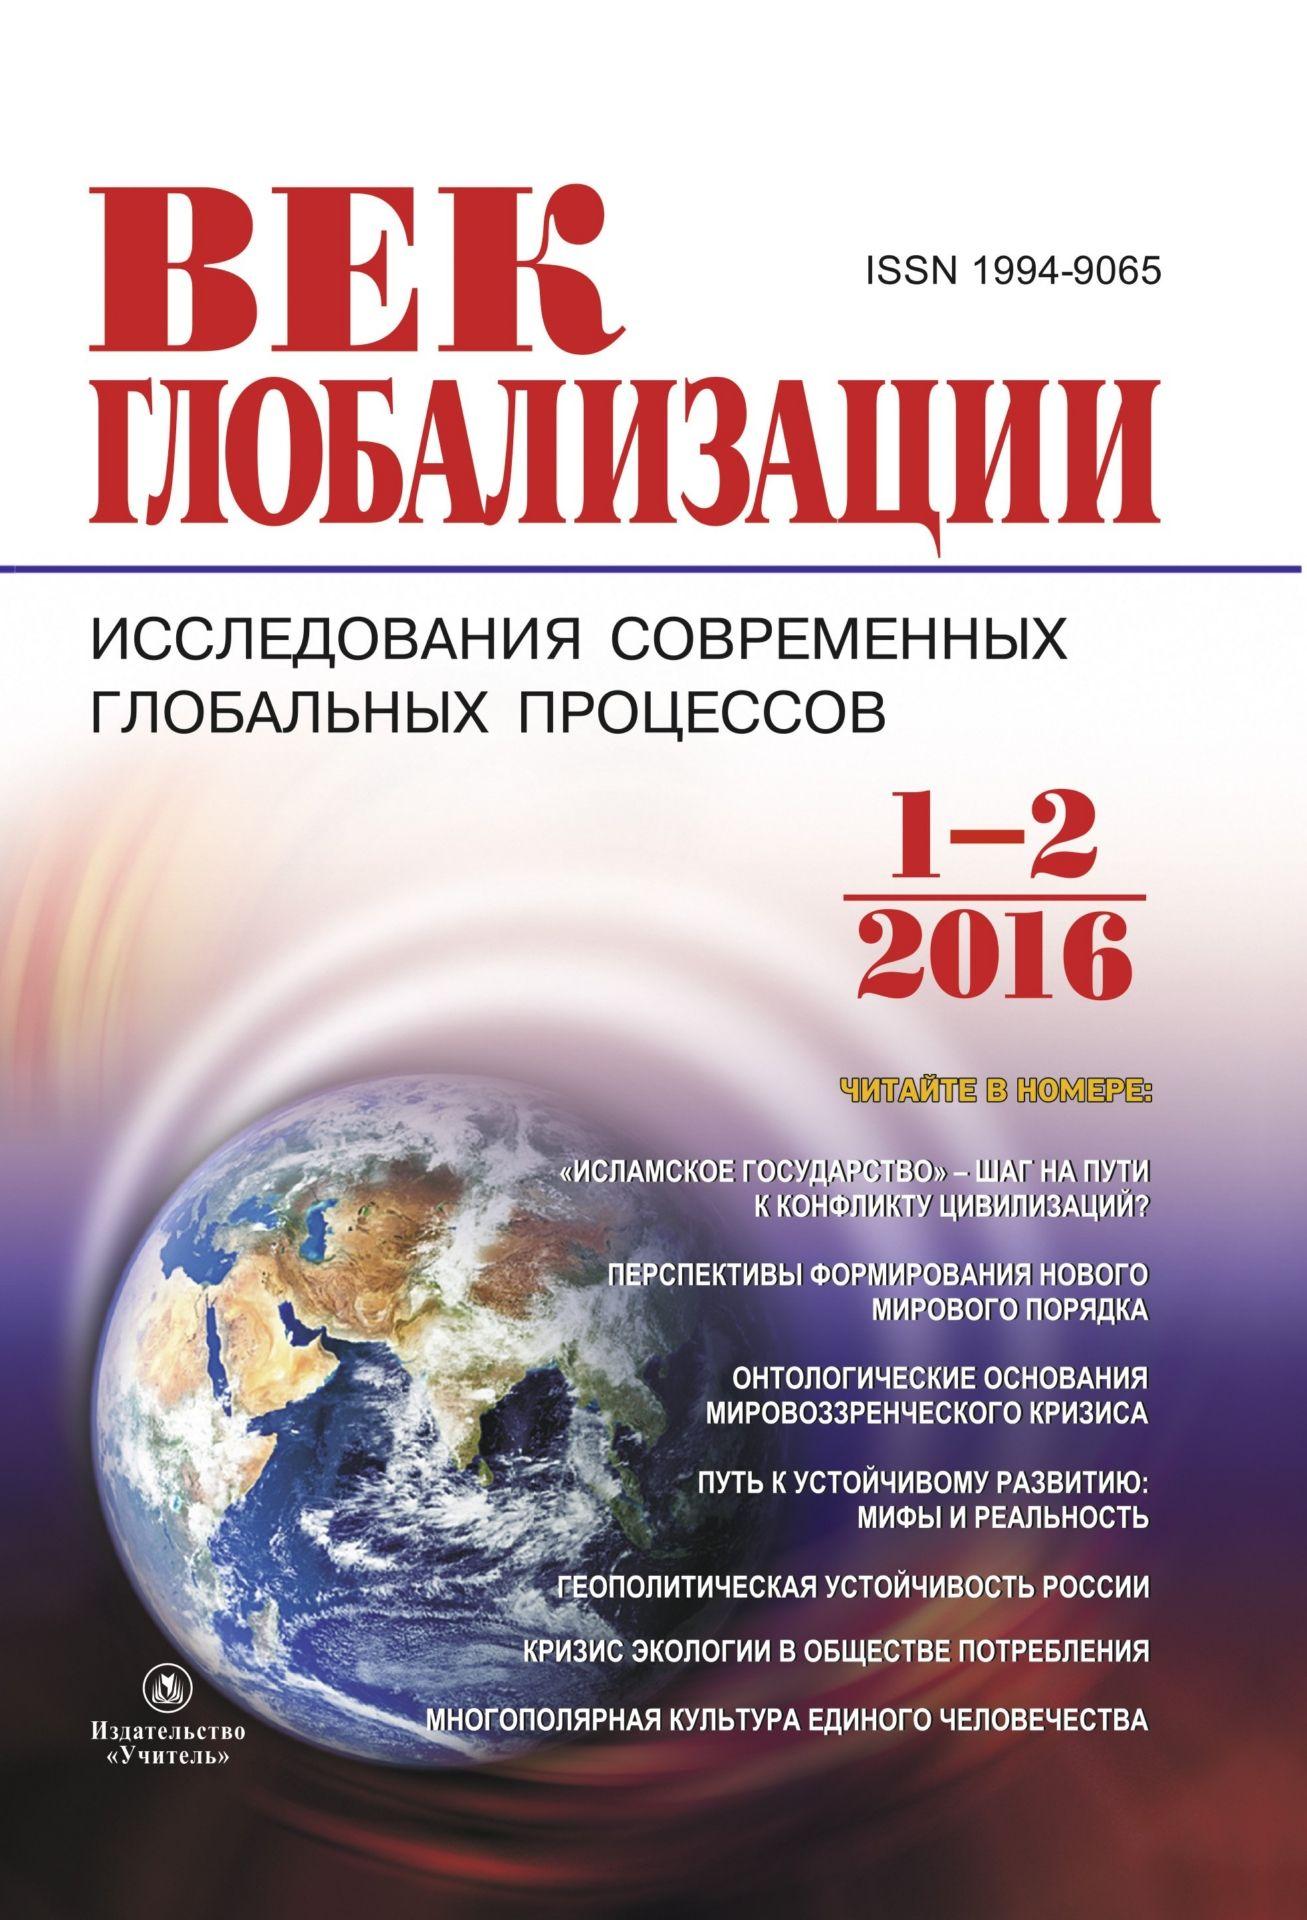 Журнал Век глобализации № 1-2, 2016